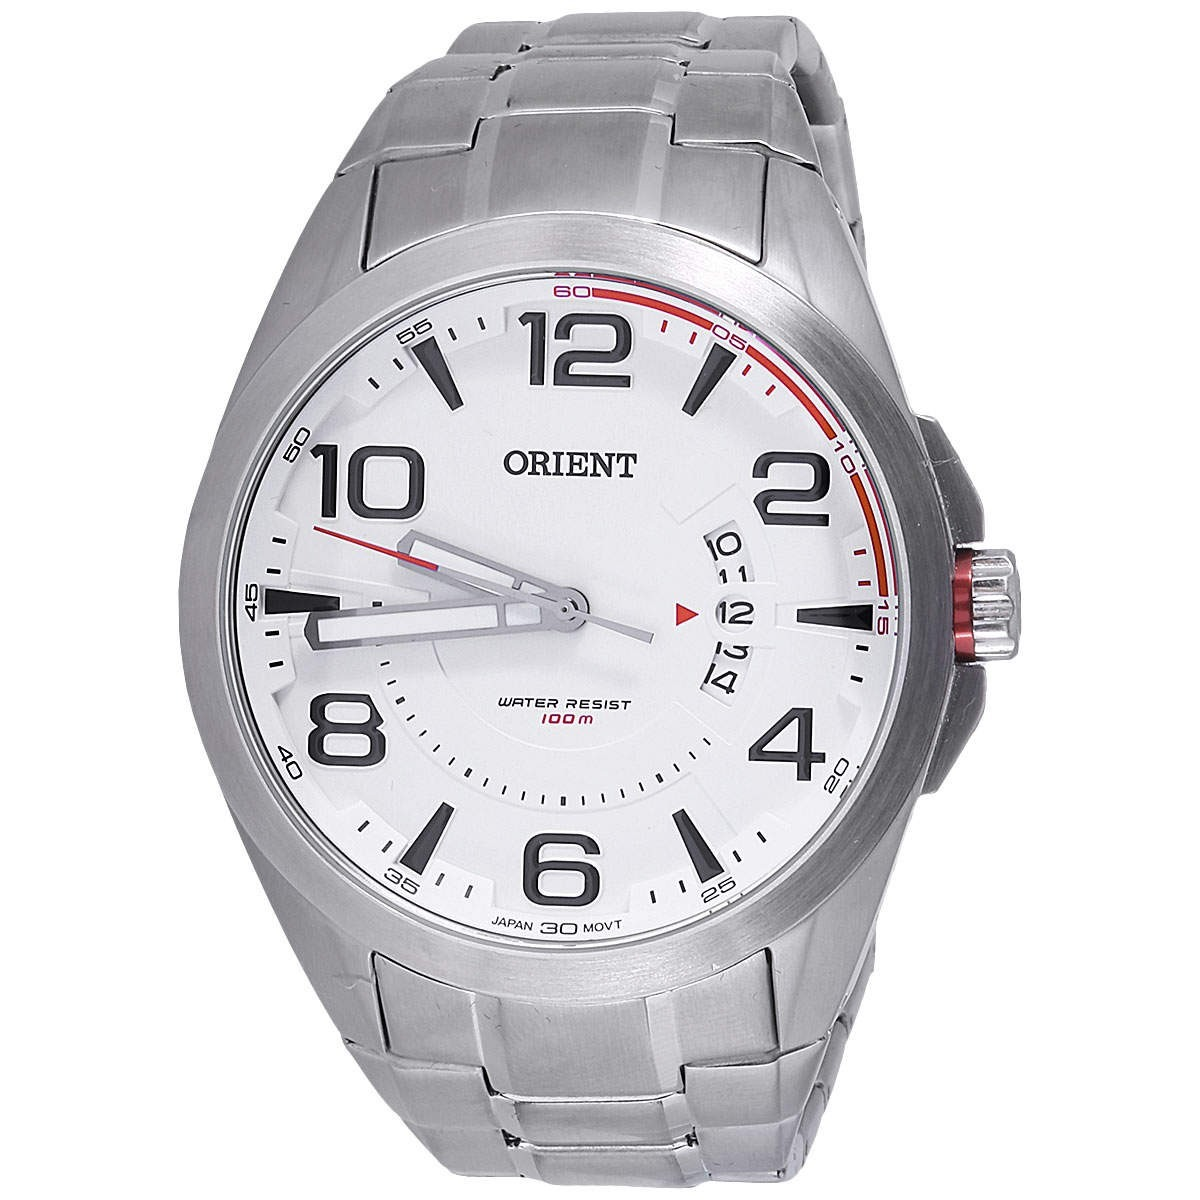 0adcb3bd51a relógio orient mbss1232 masculino sport mostrador branco · relógio orient  masculino. Carregando zoom.